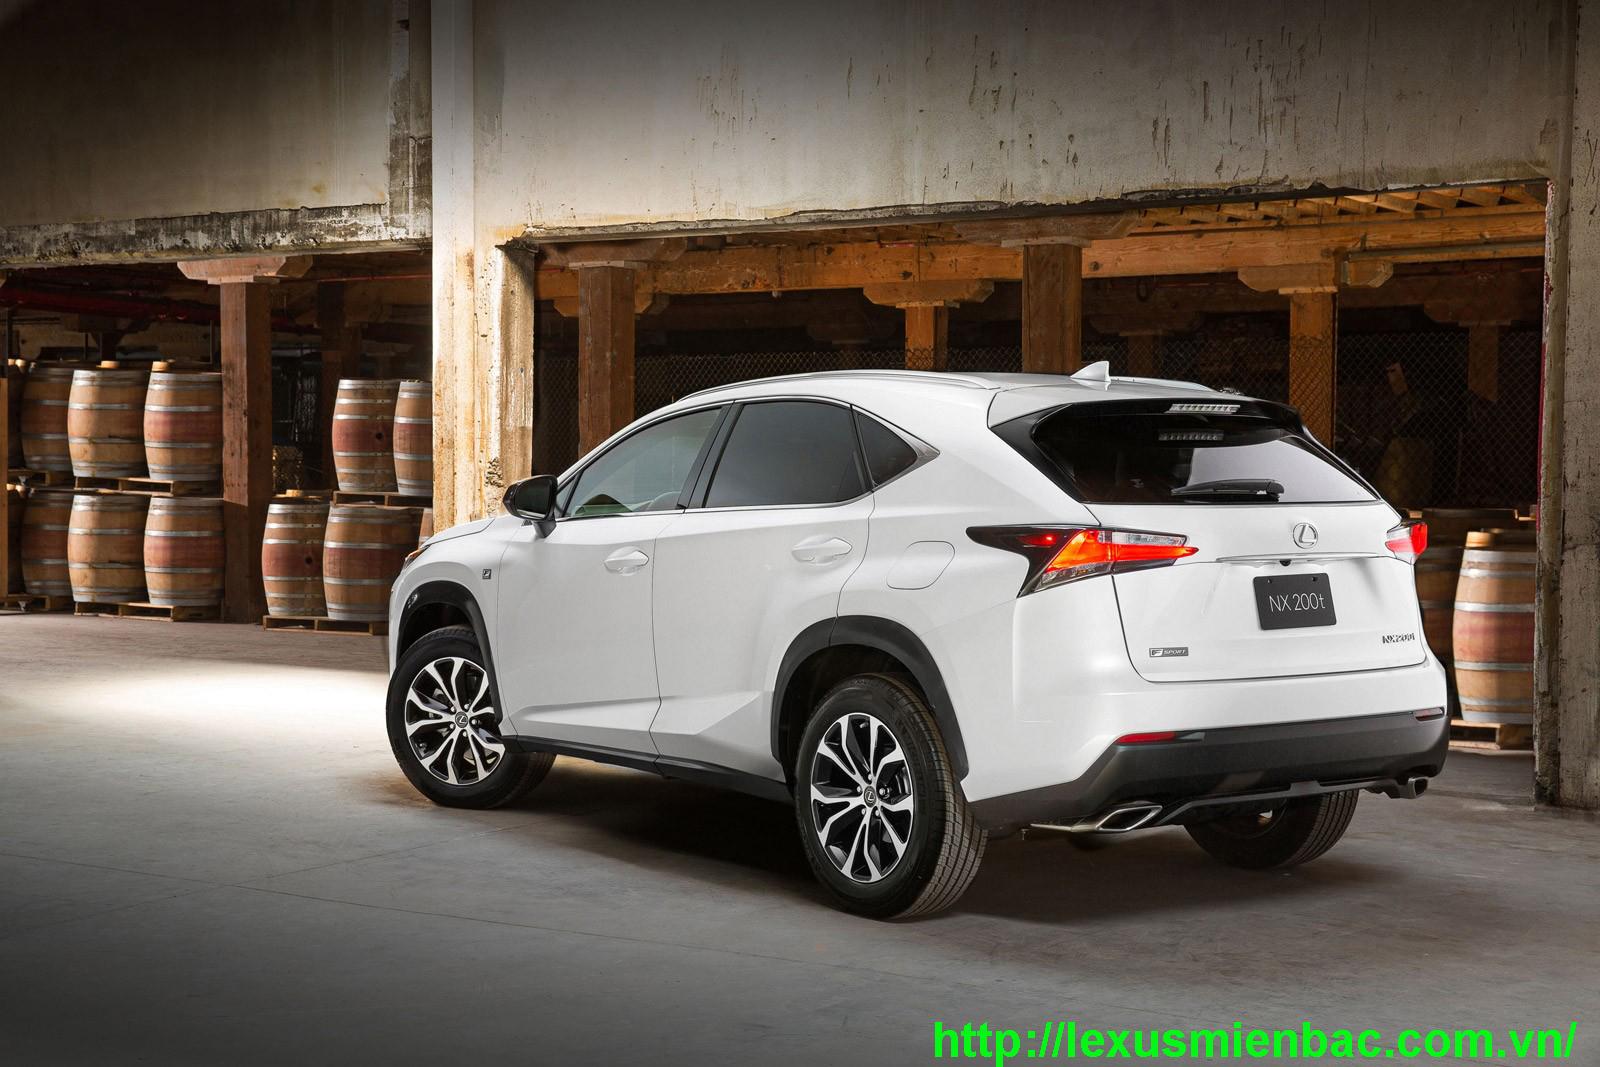 xe-lexus-nx-200t-chinh-hang